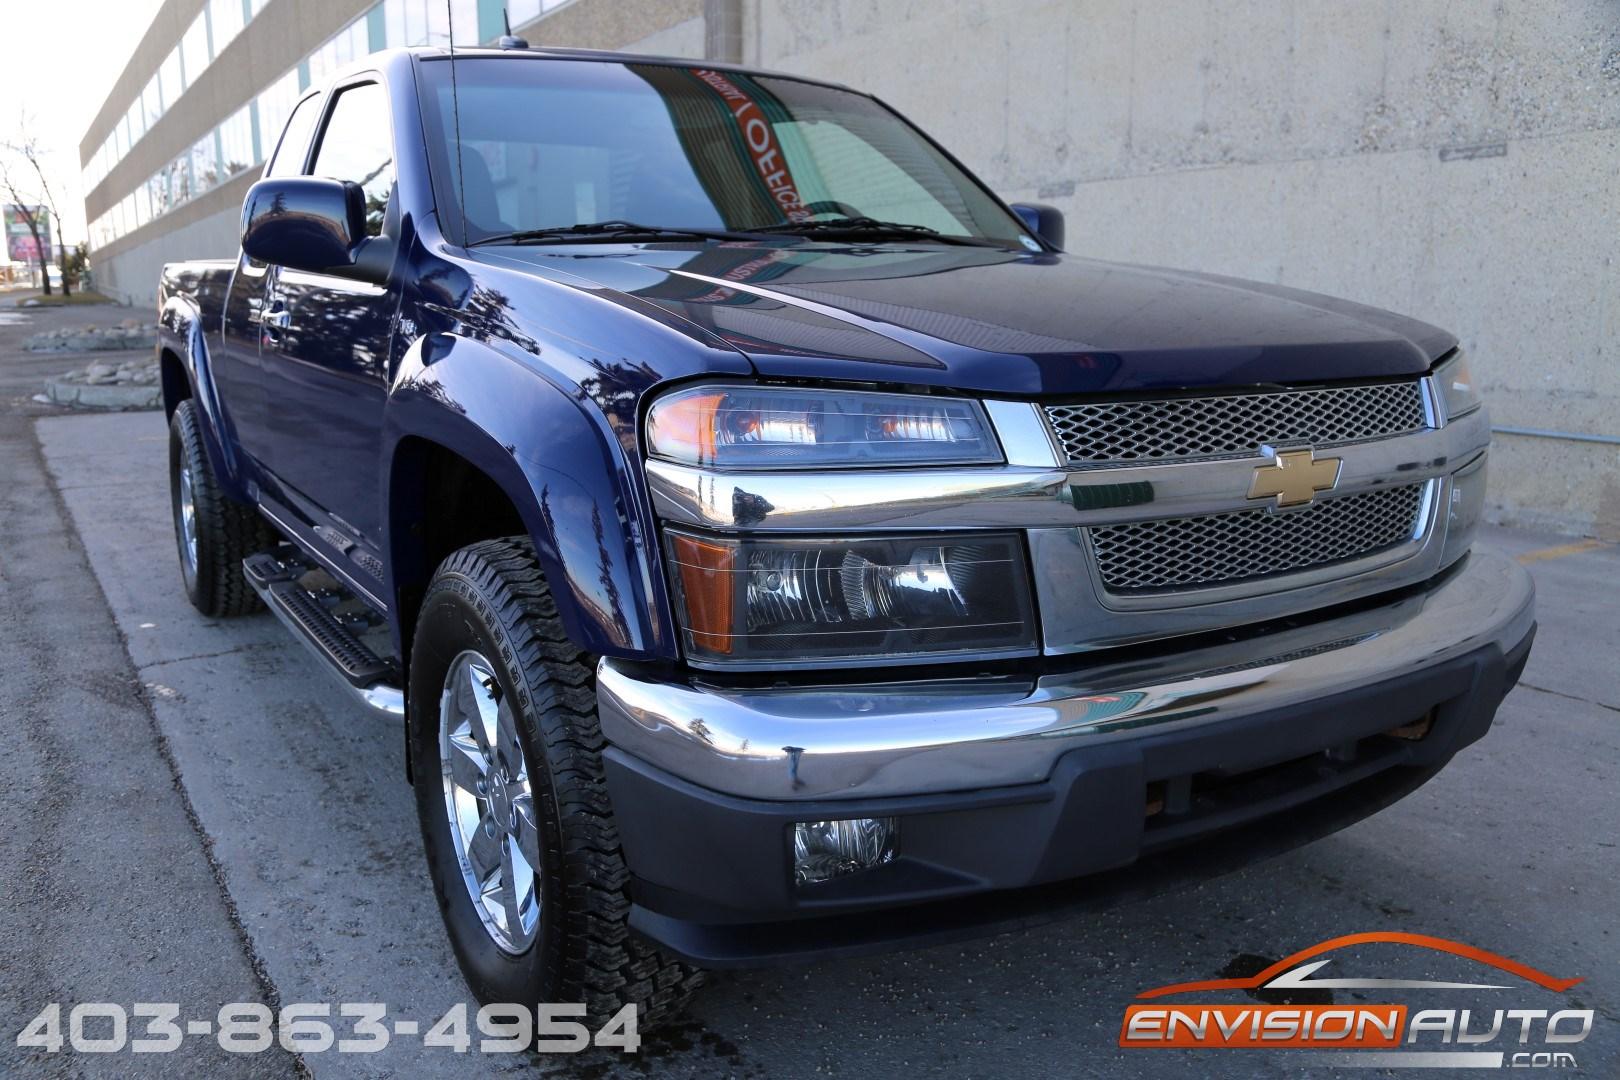 Chevrolet Colorado Lt 4 4 Z71 5 3l V8